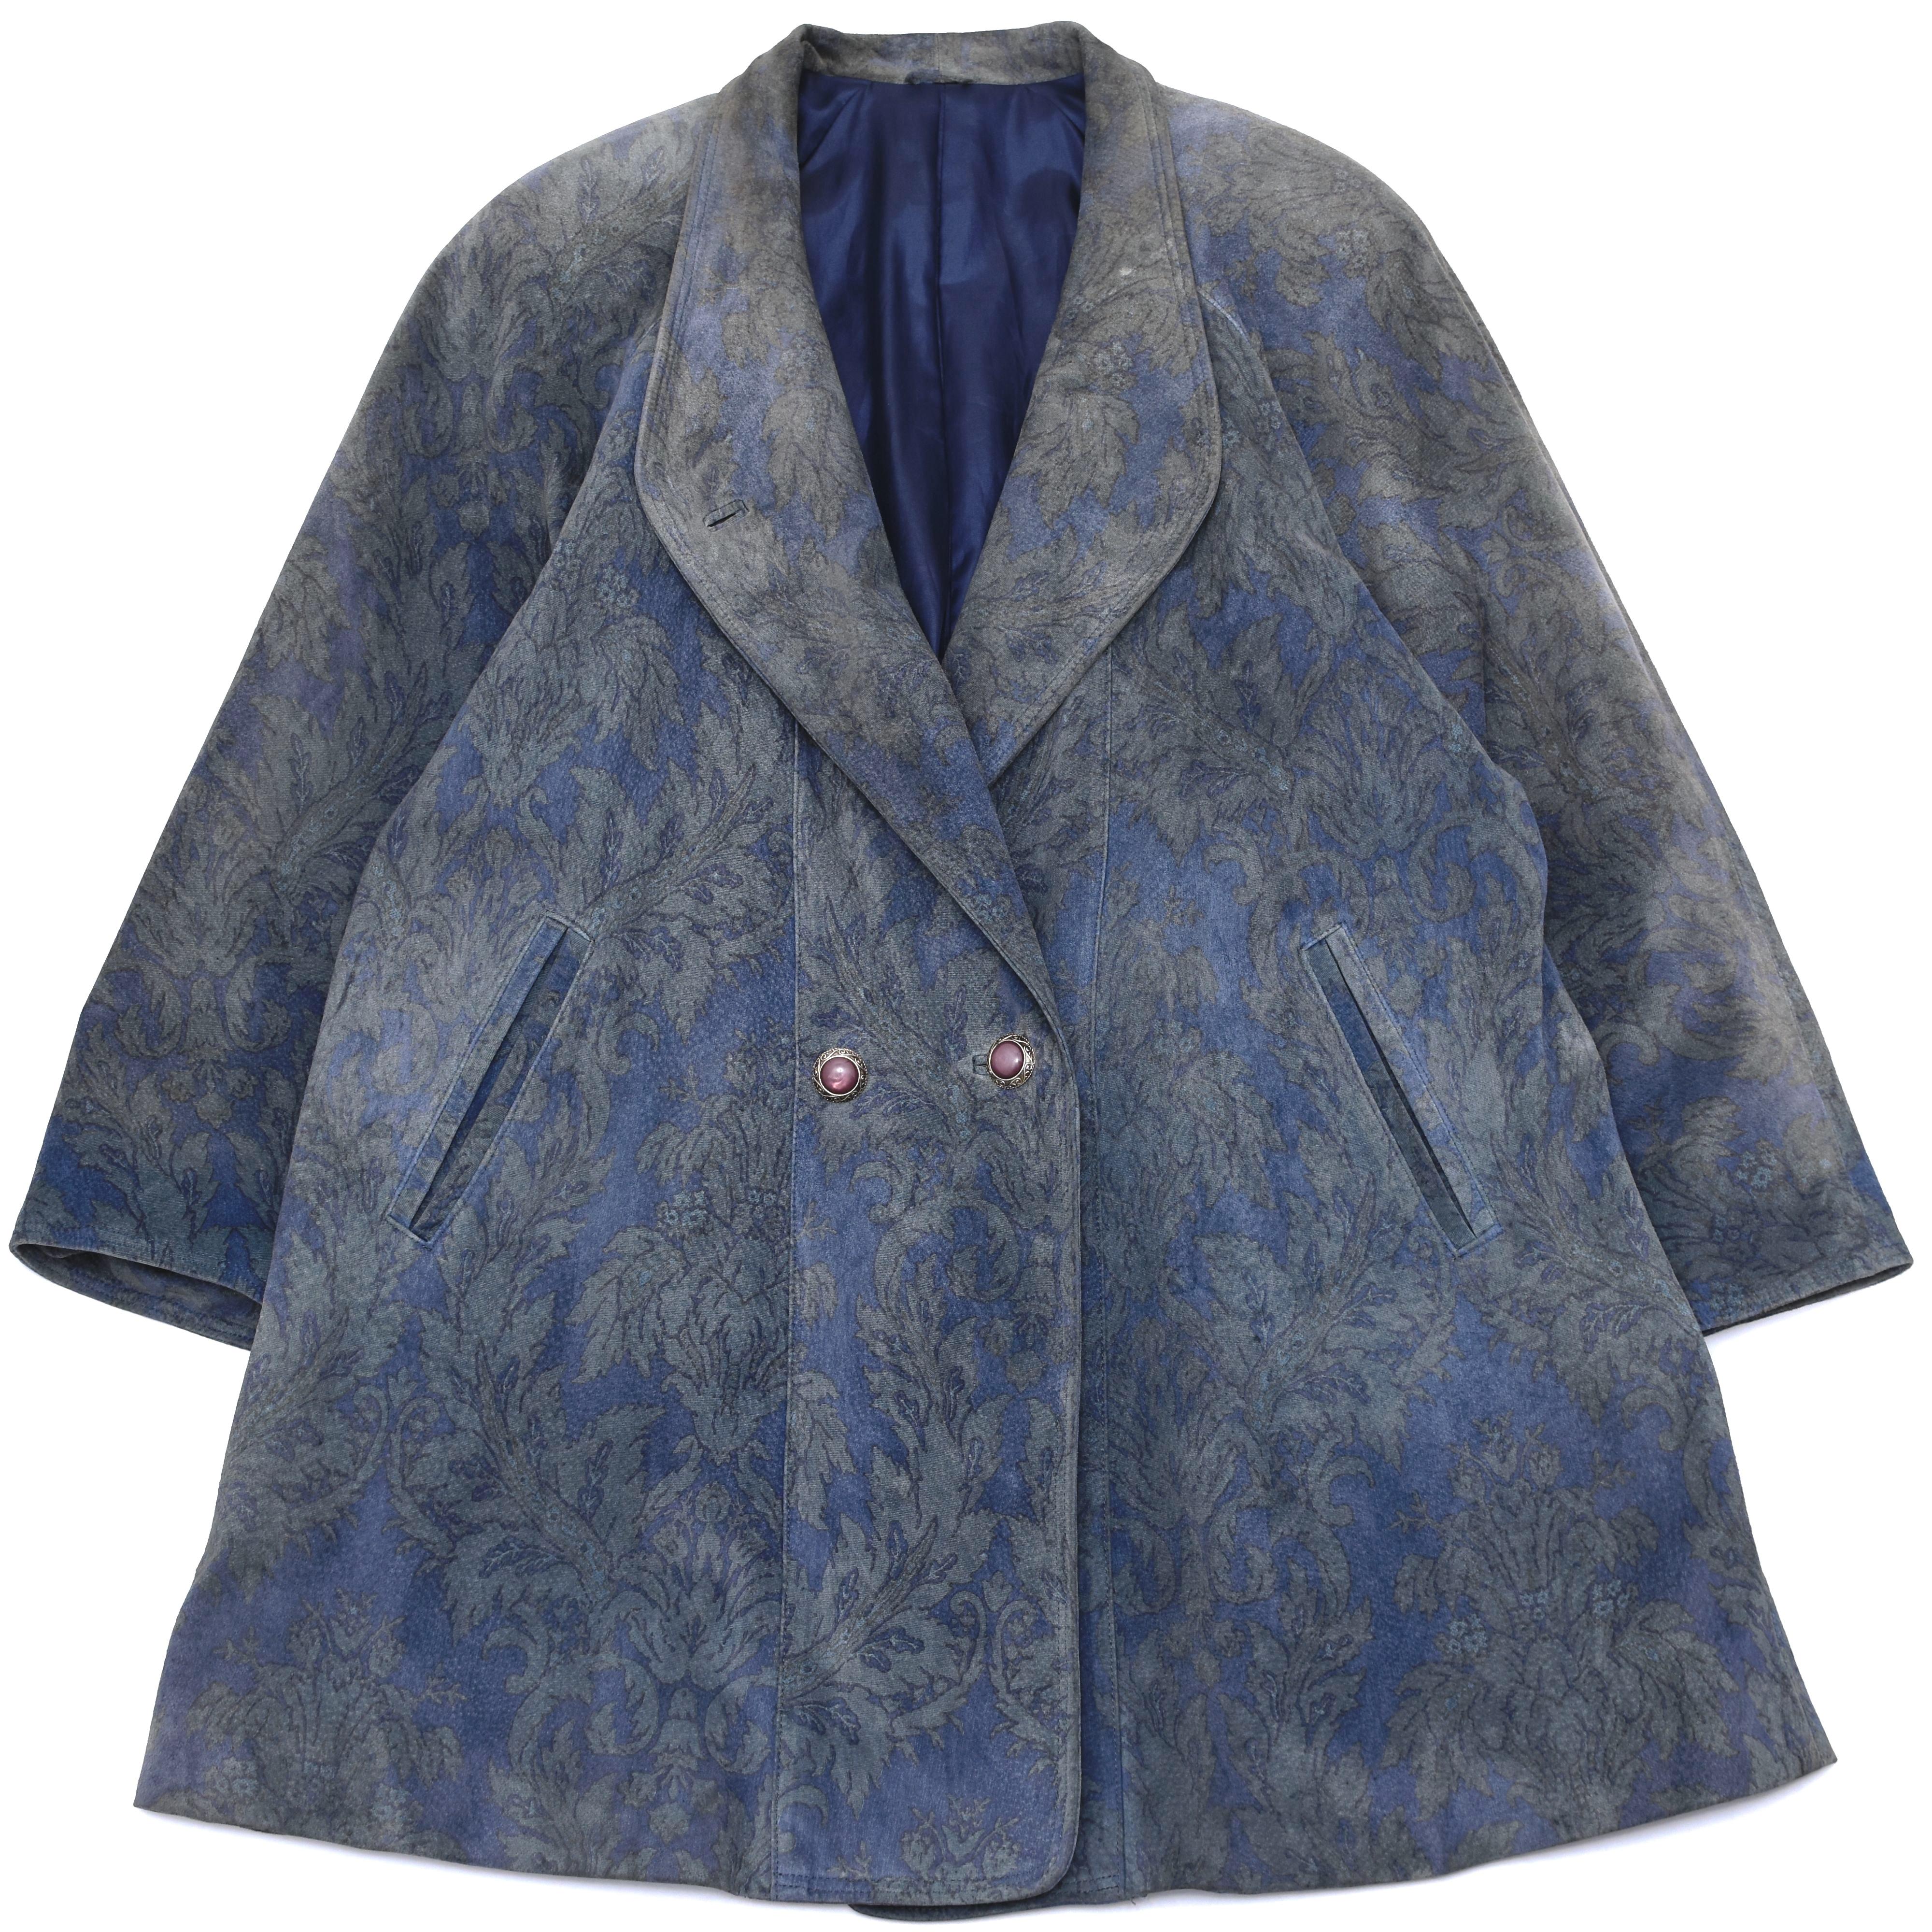 Unisex Vintage print suede leather coat